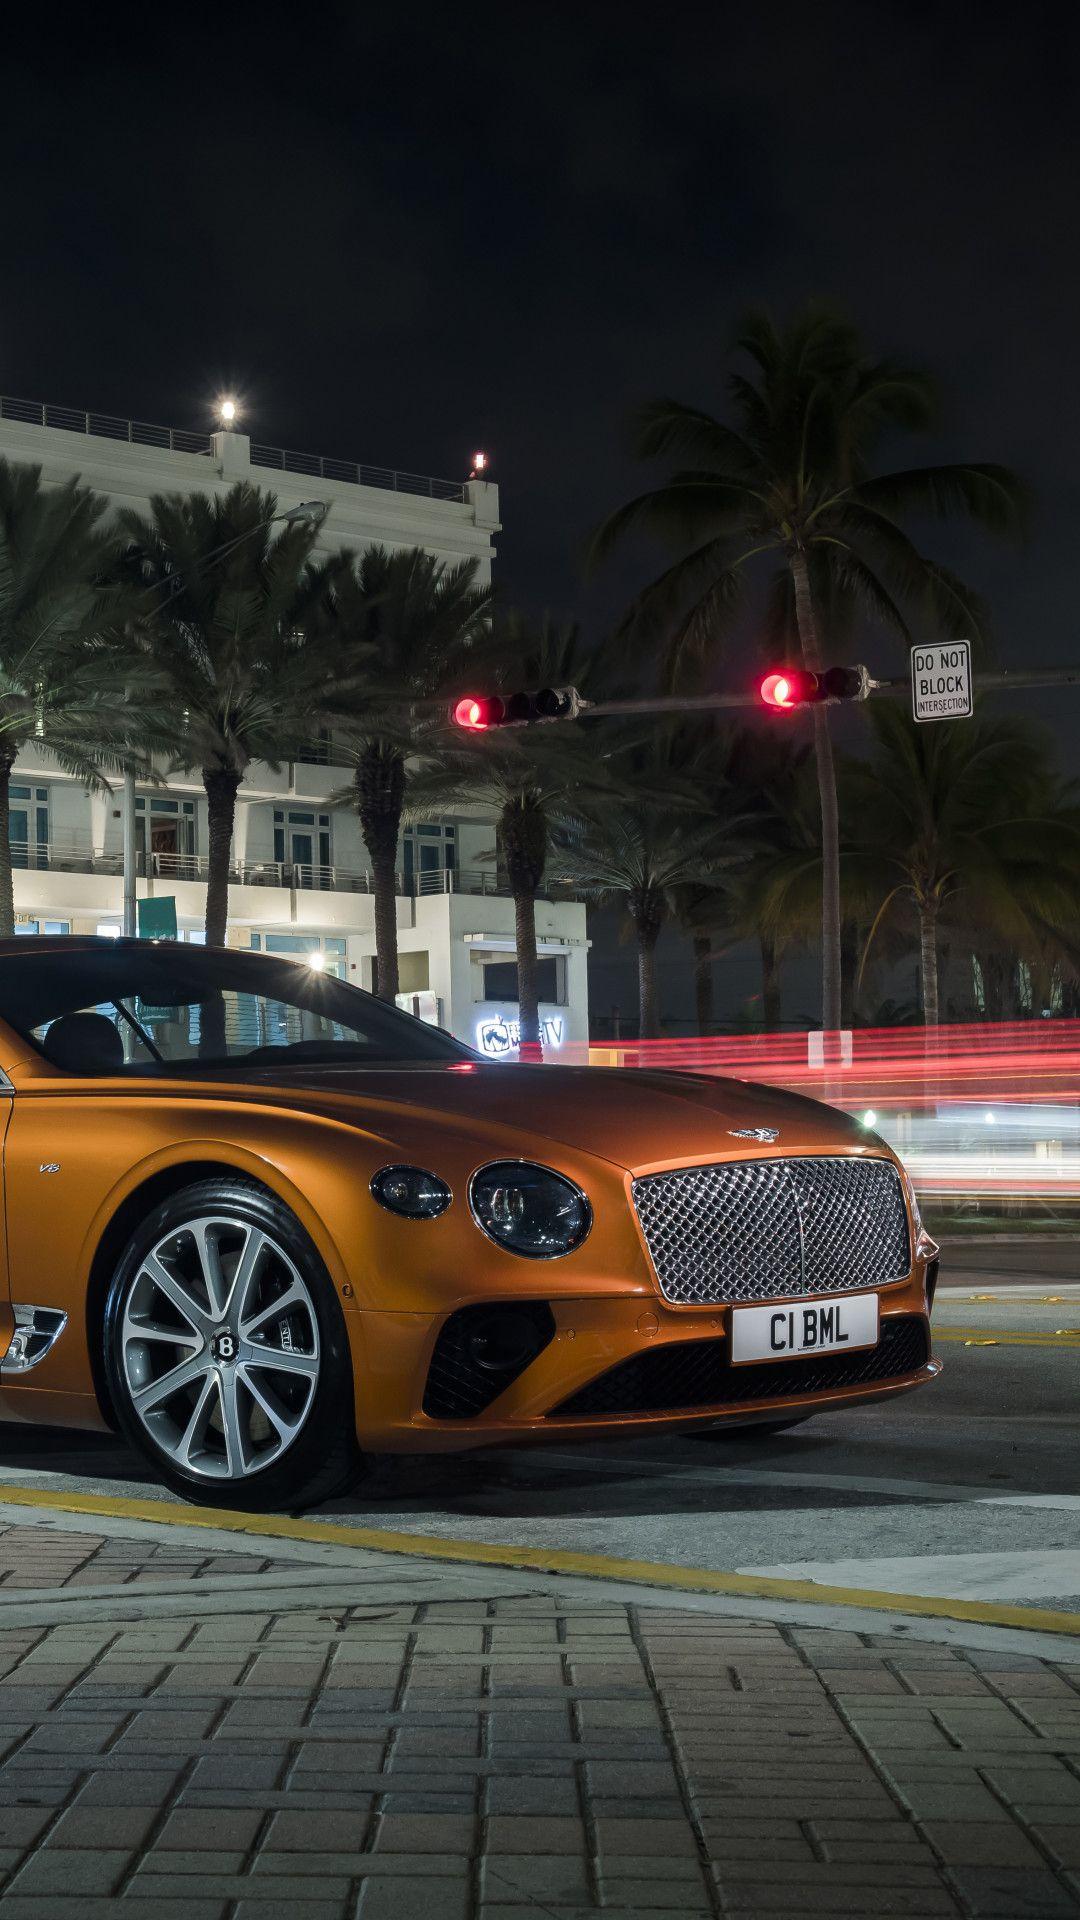 2019 Bentley Continental Gt V8 8k Mobile Wallpaper Iphone